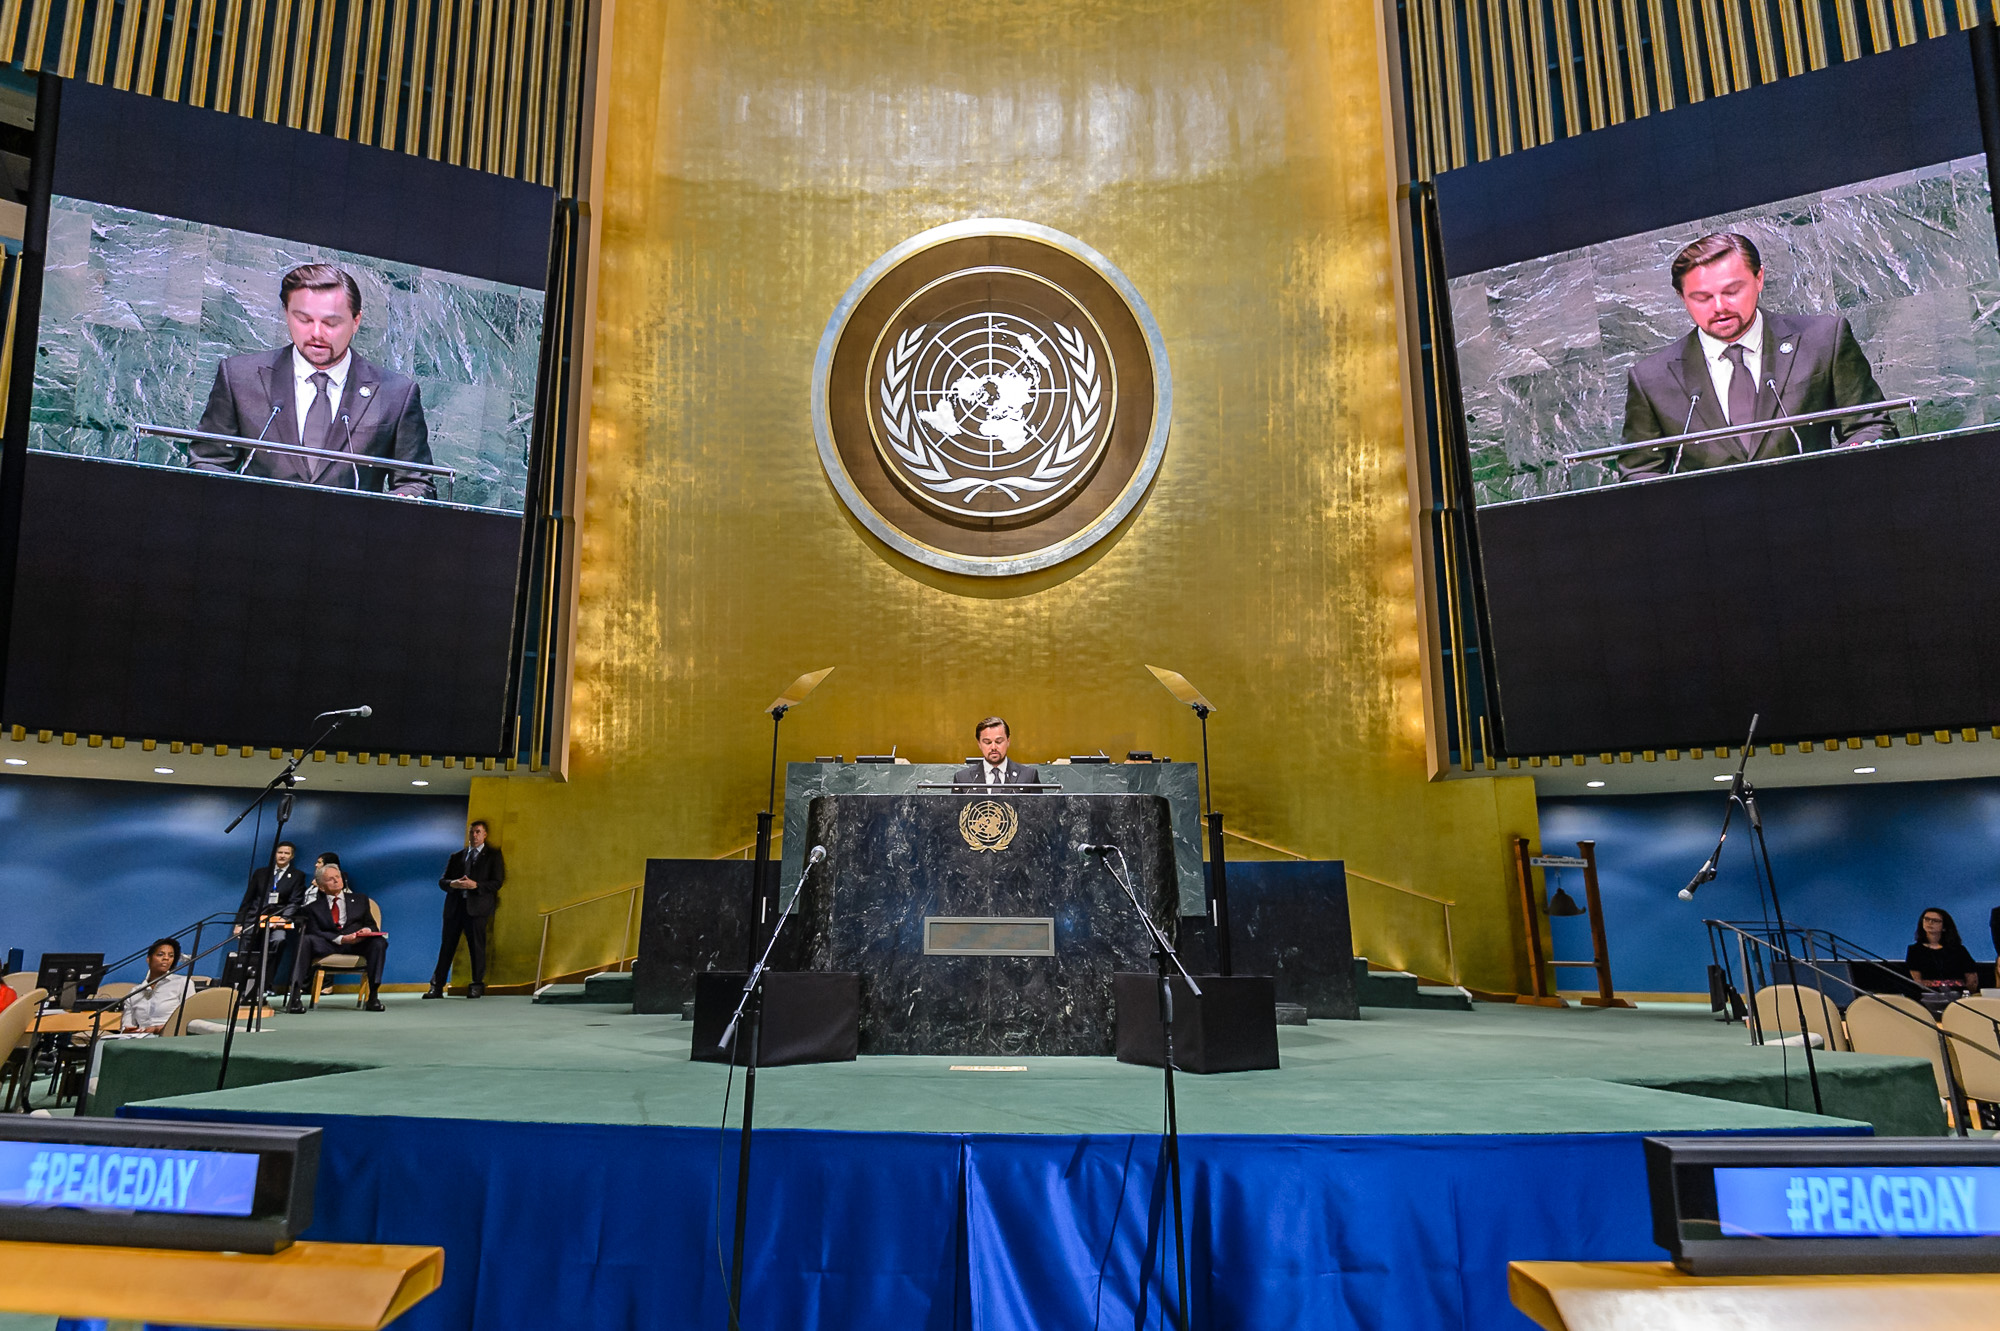 0890_blu_Peace_Day_at_UN.jpg